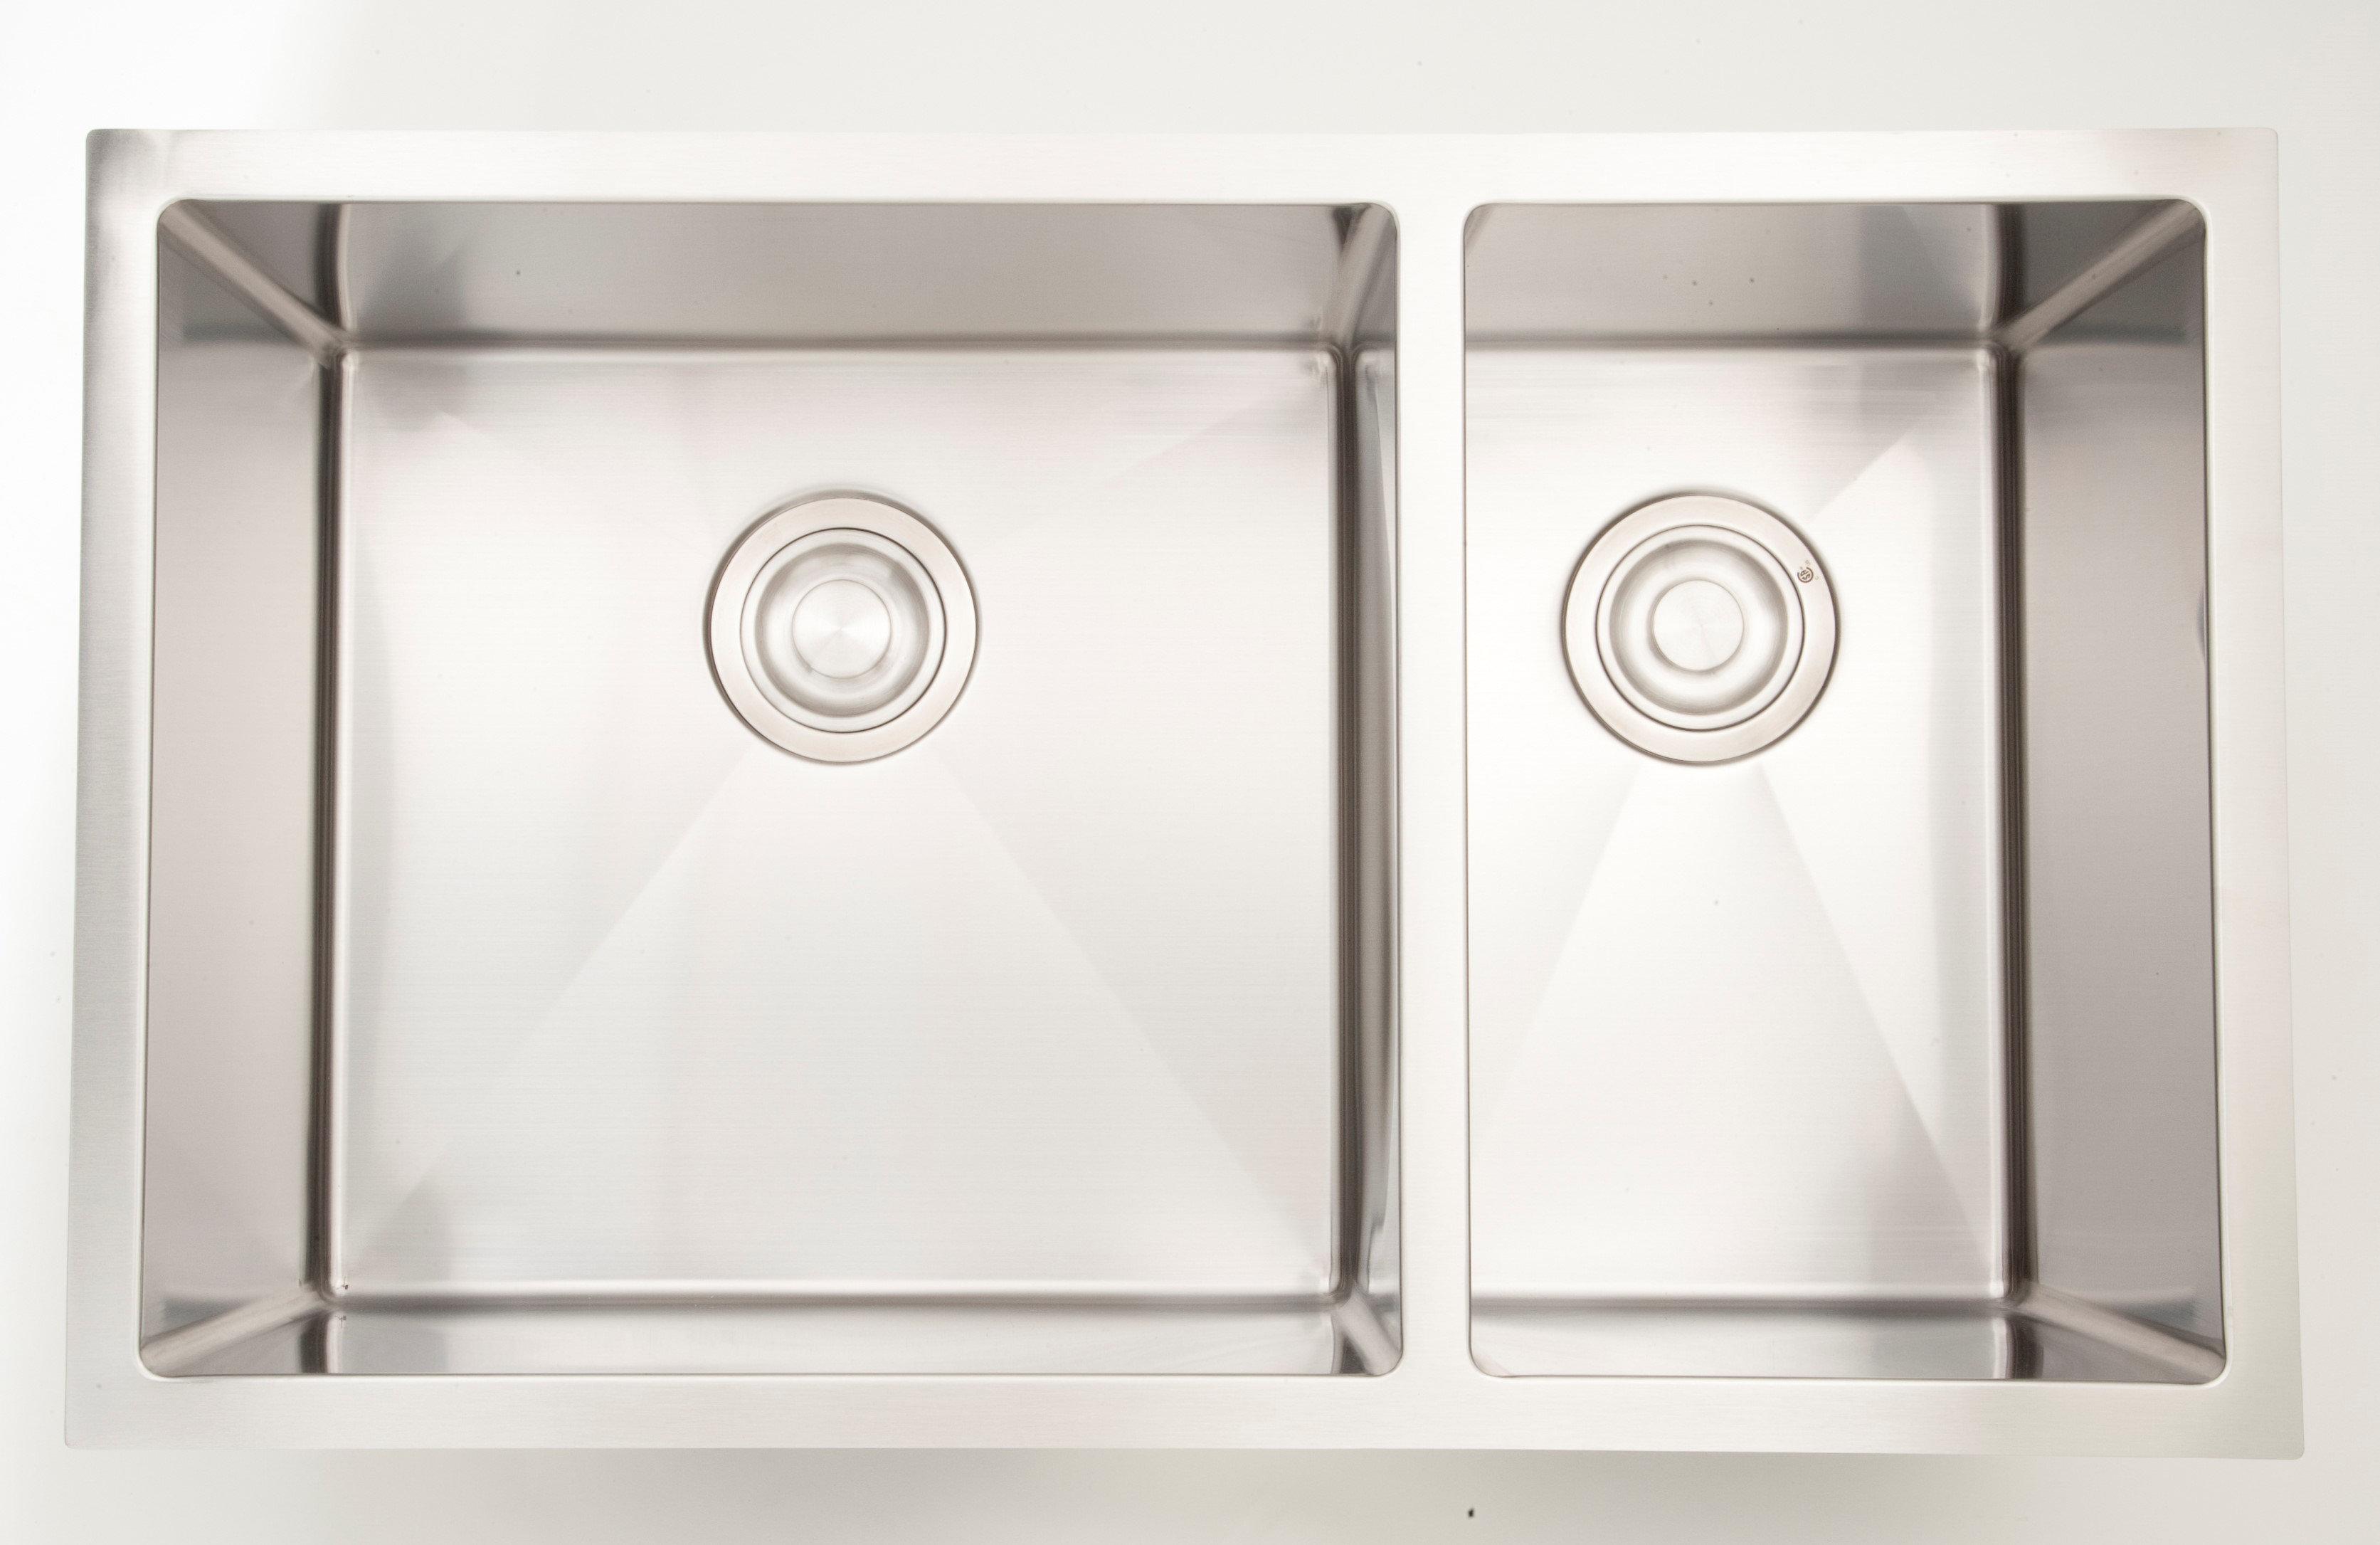 Royalpurplebathkitchen 28 X 18 Double Basin Undermount Kitchen Sink With 18 Gauge Wayfair